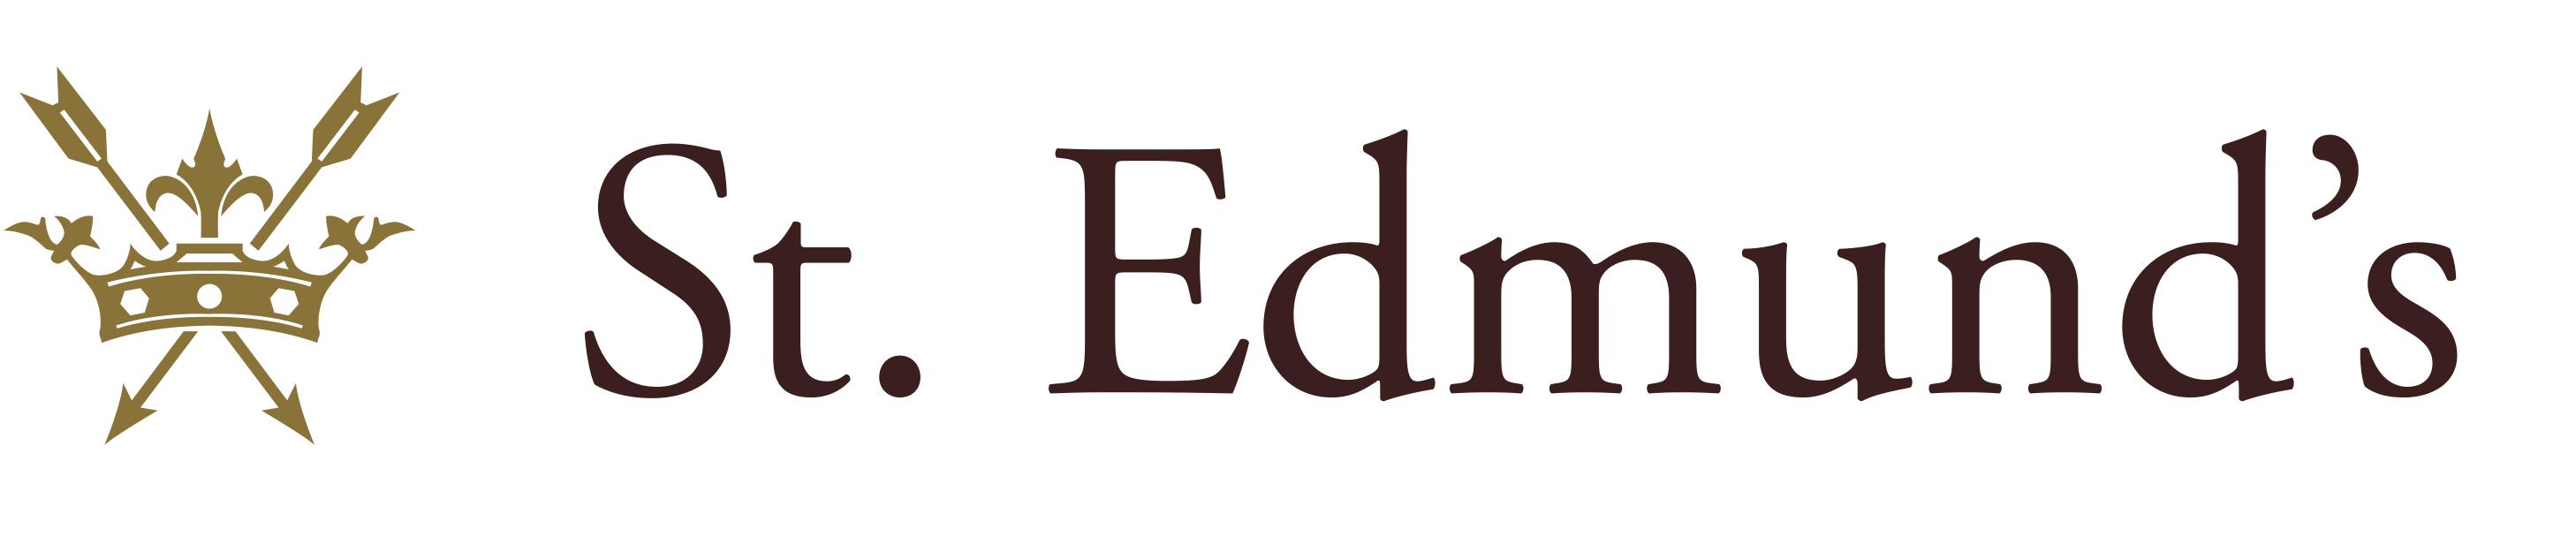 Edmunds Logos.